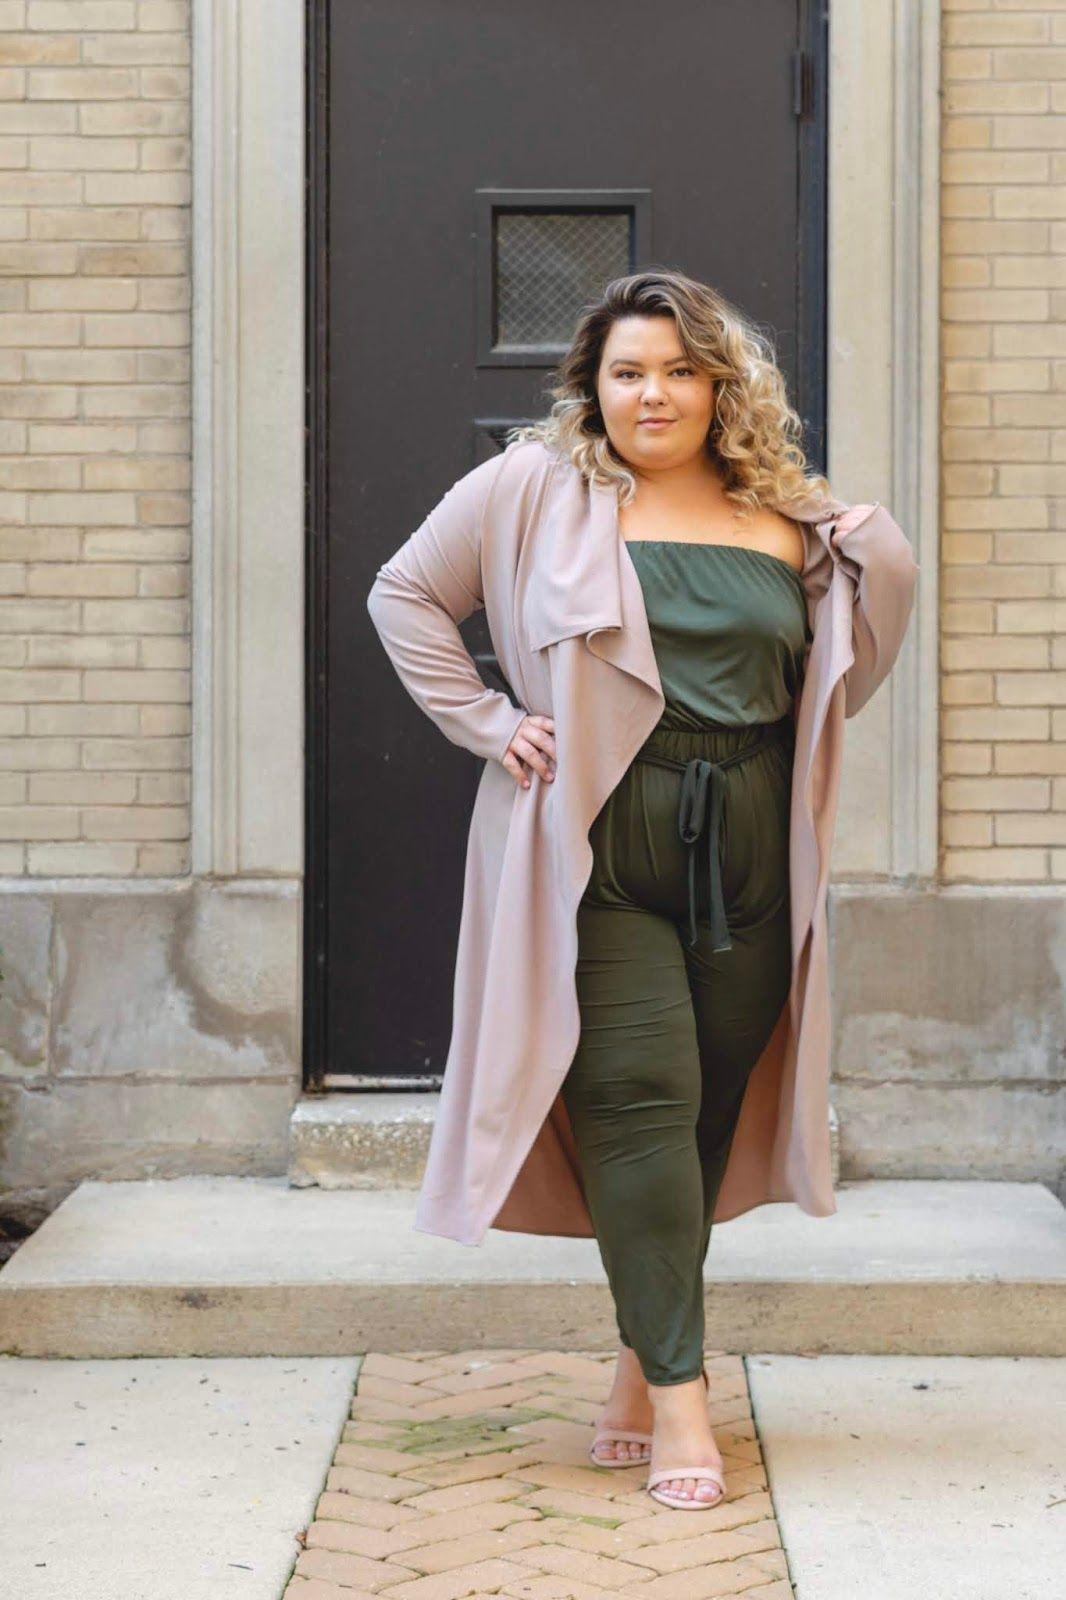 Chicago Plus Size Petite Fashion Blogger And Model Natalie Craig In Fashion Nova Curves Taupe Trench Co Petite Fashion Plus Size Fashion Blog Plus Size Fashion